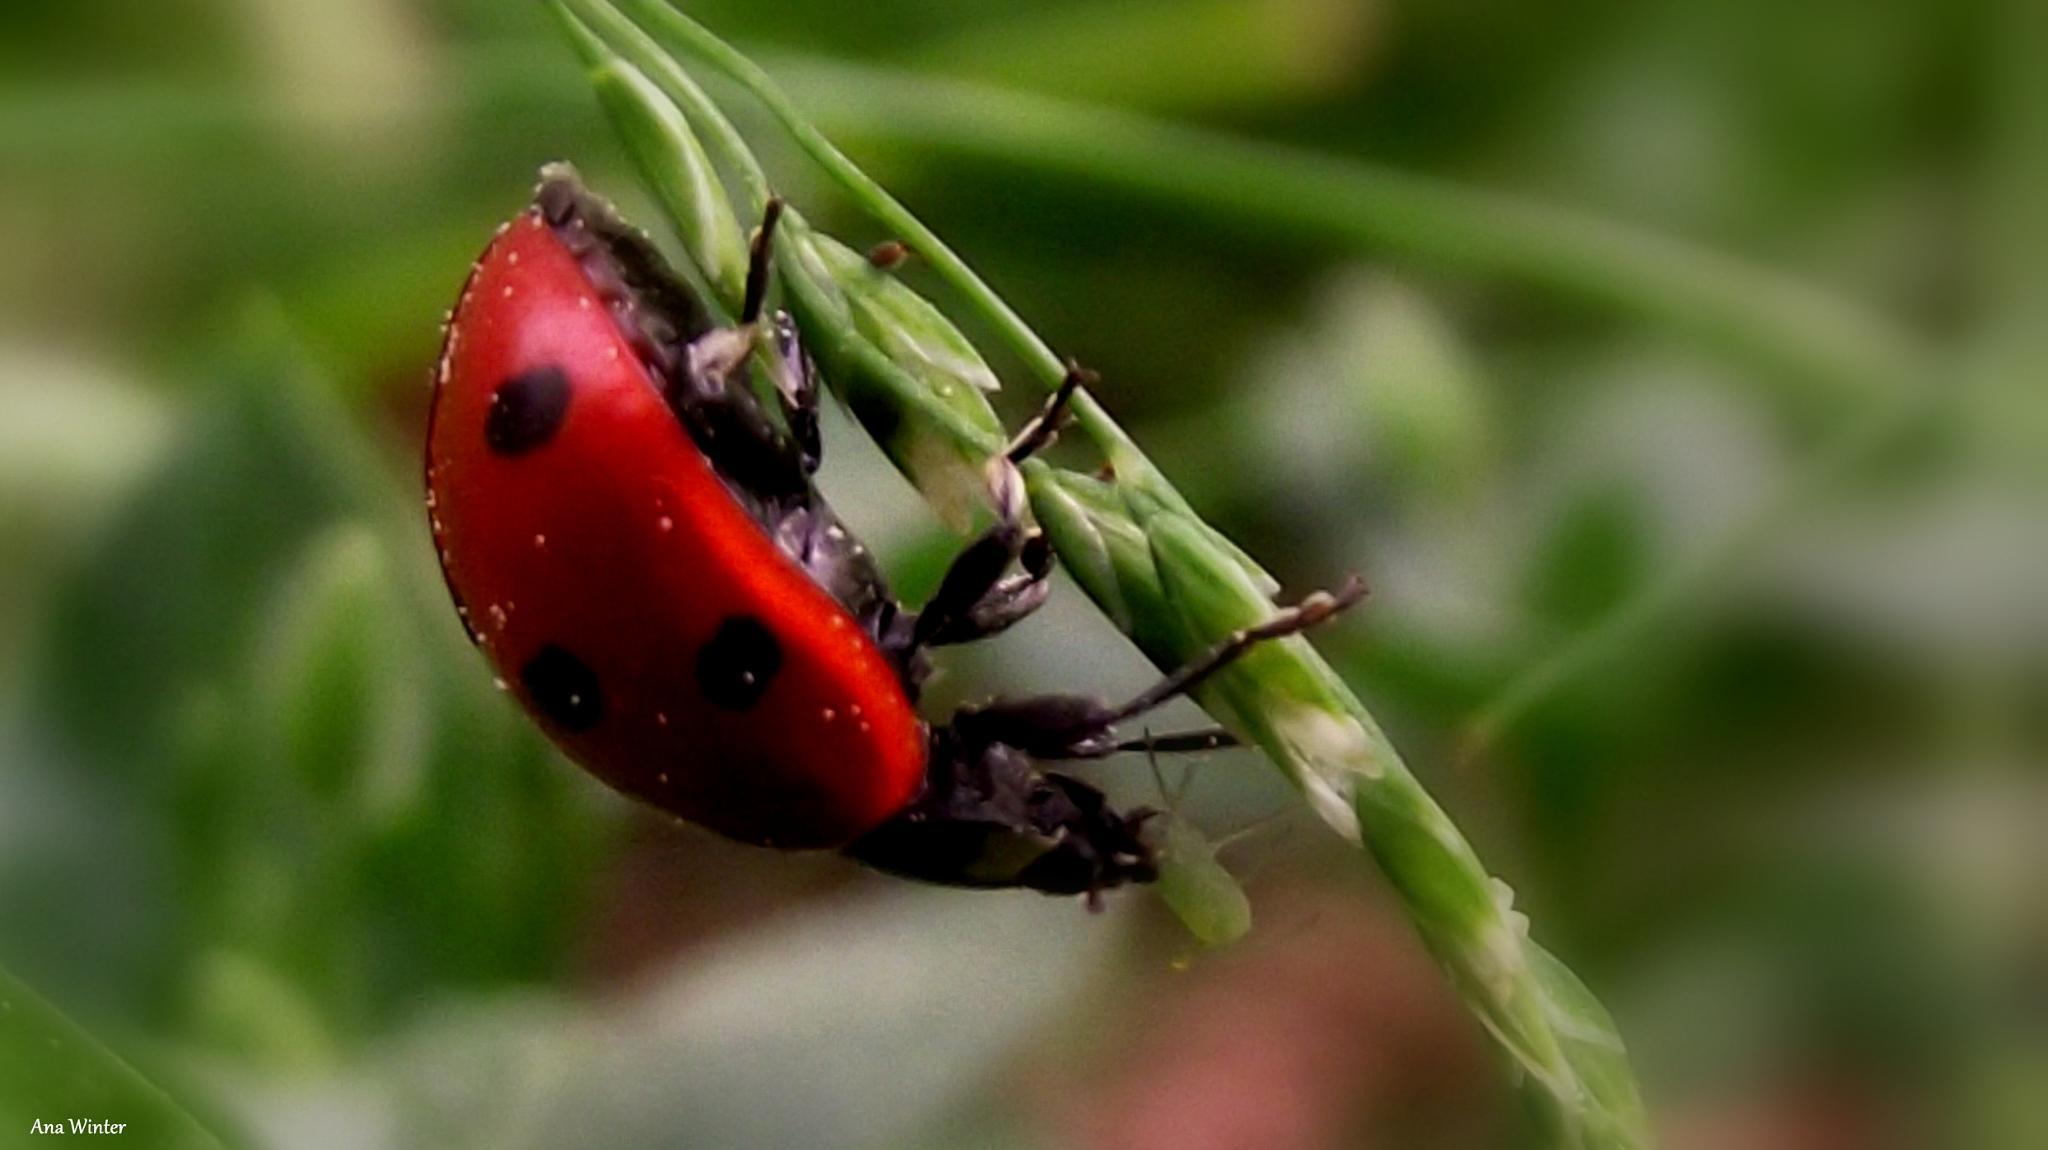 LadyBug having lunch by Ana Winter